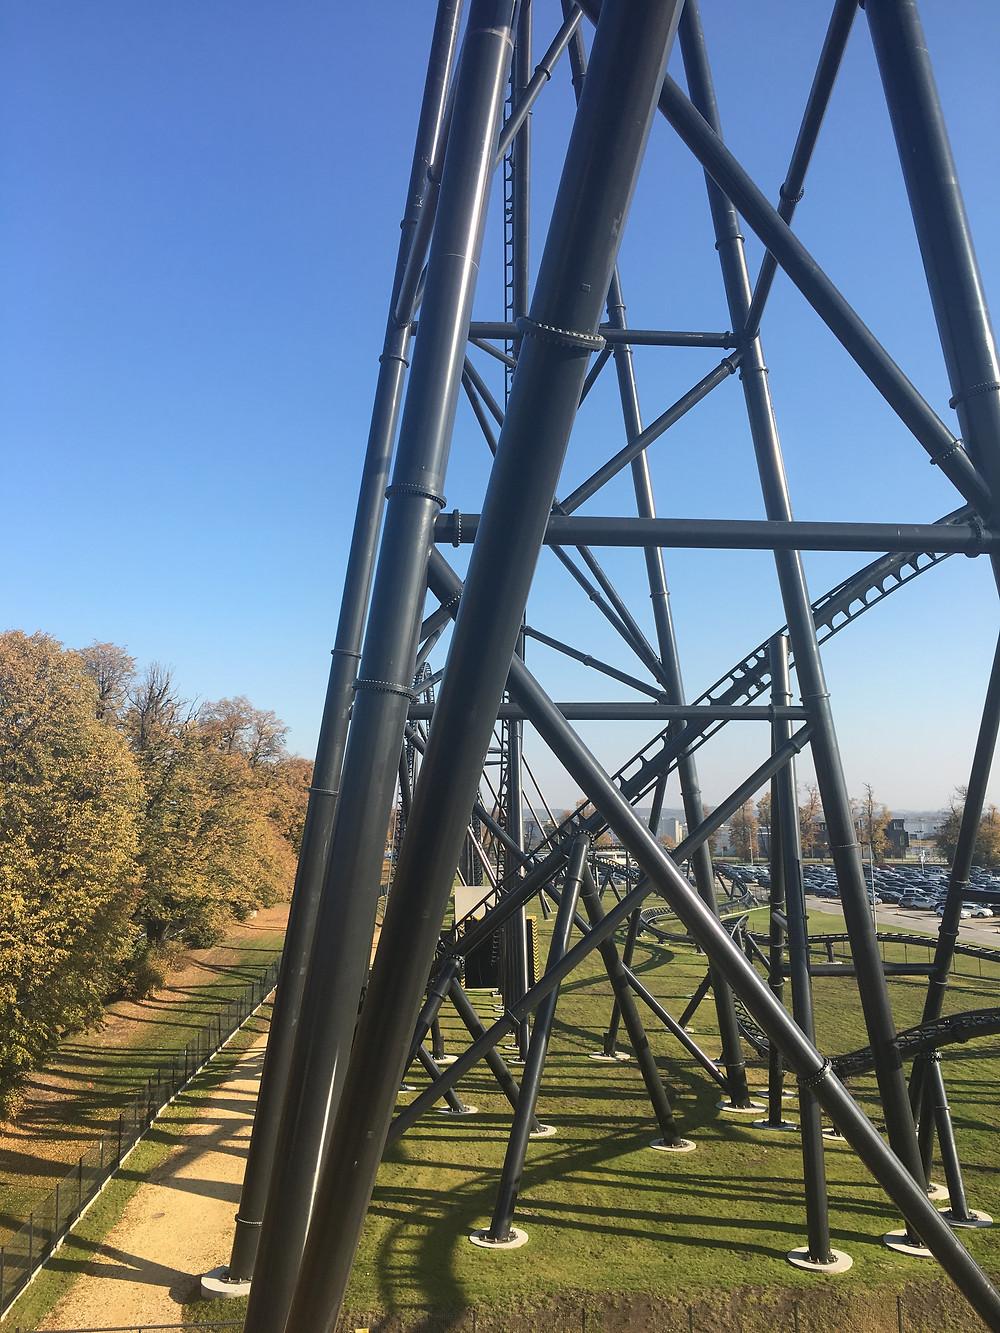 Energylandia, Rollercoaster, Poland